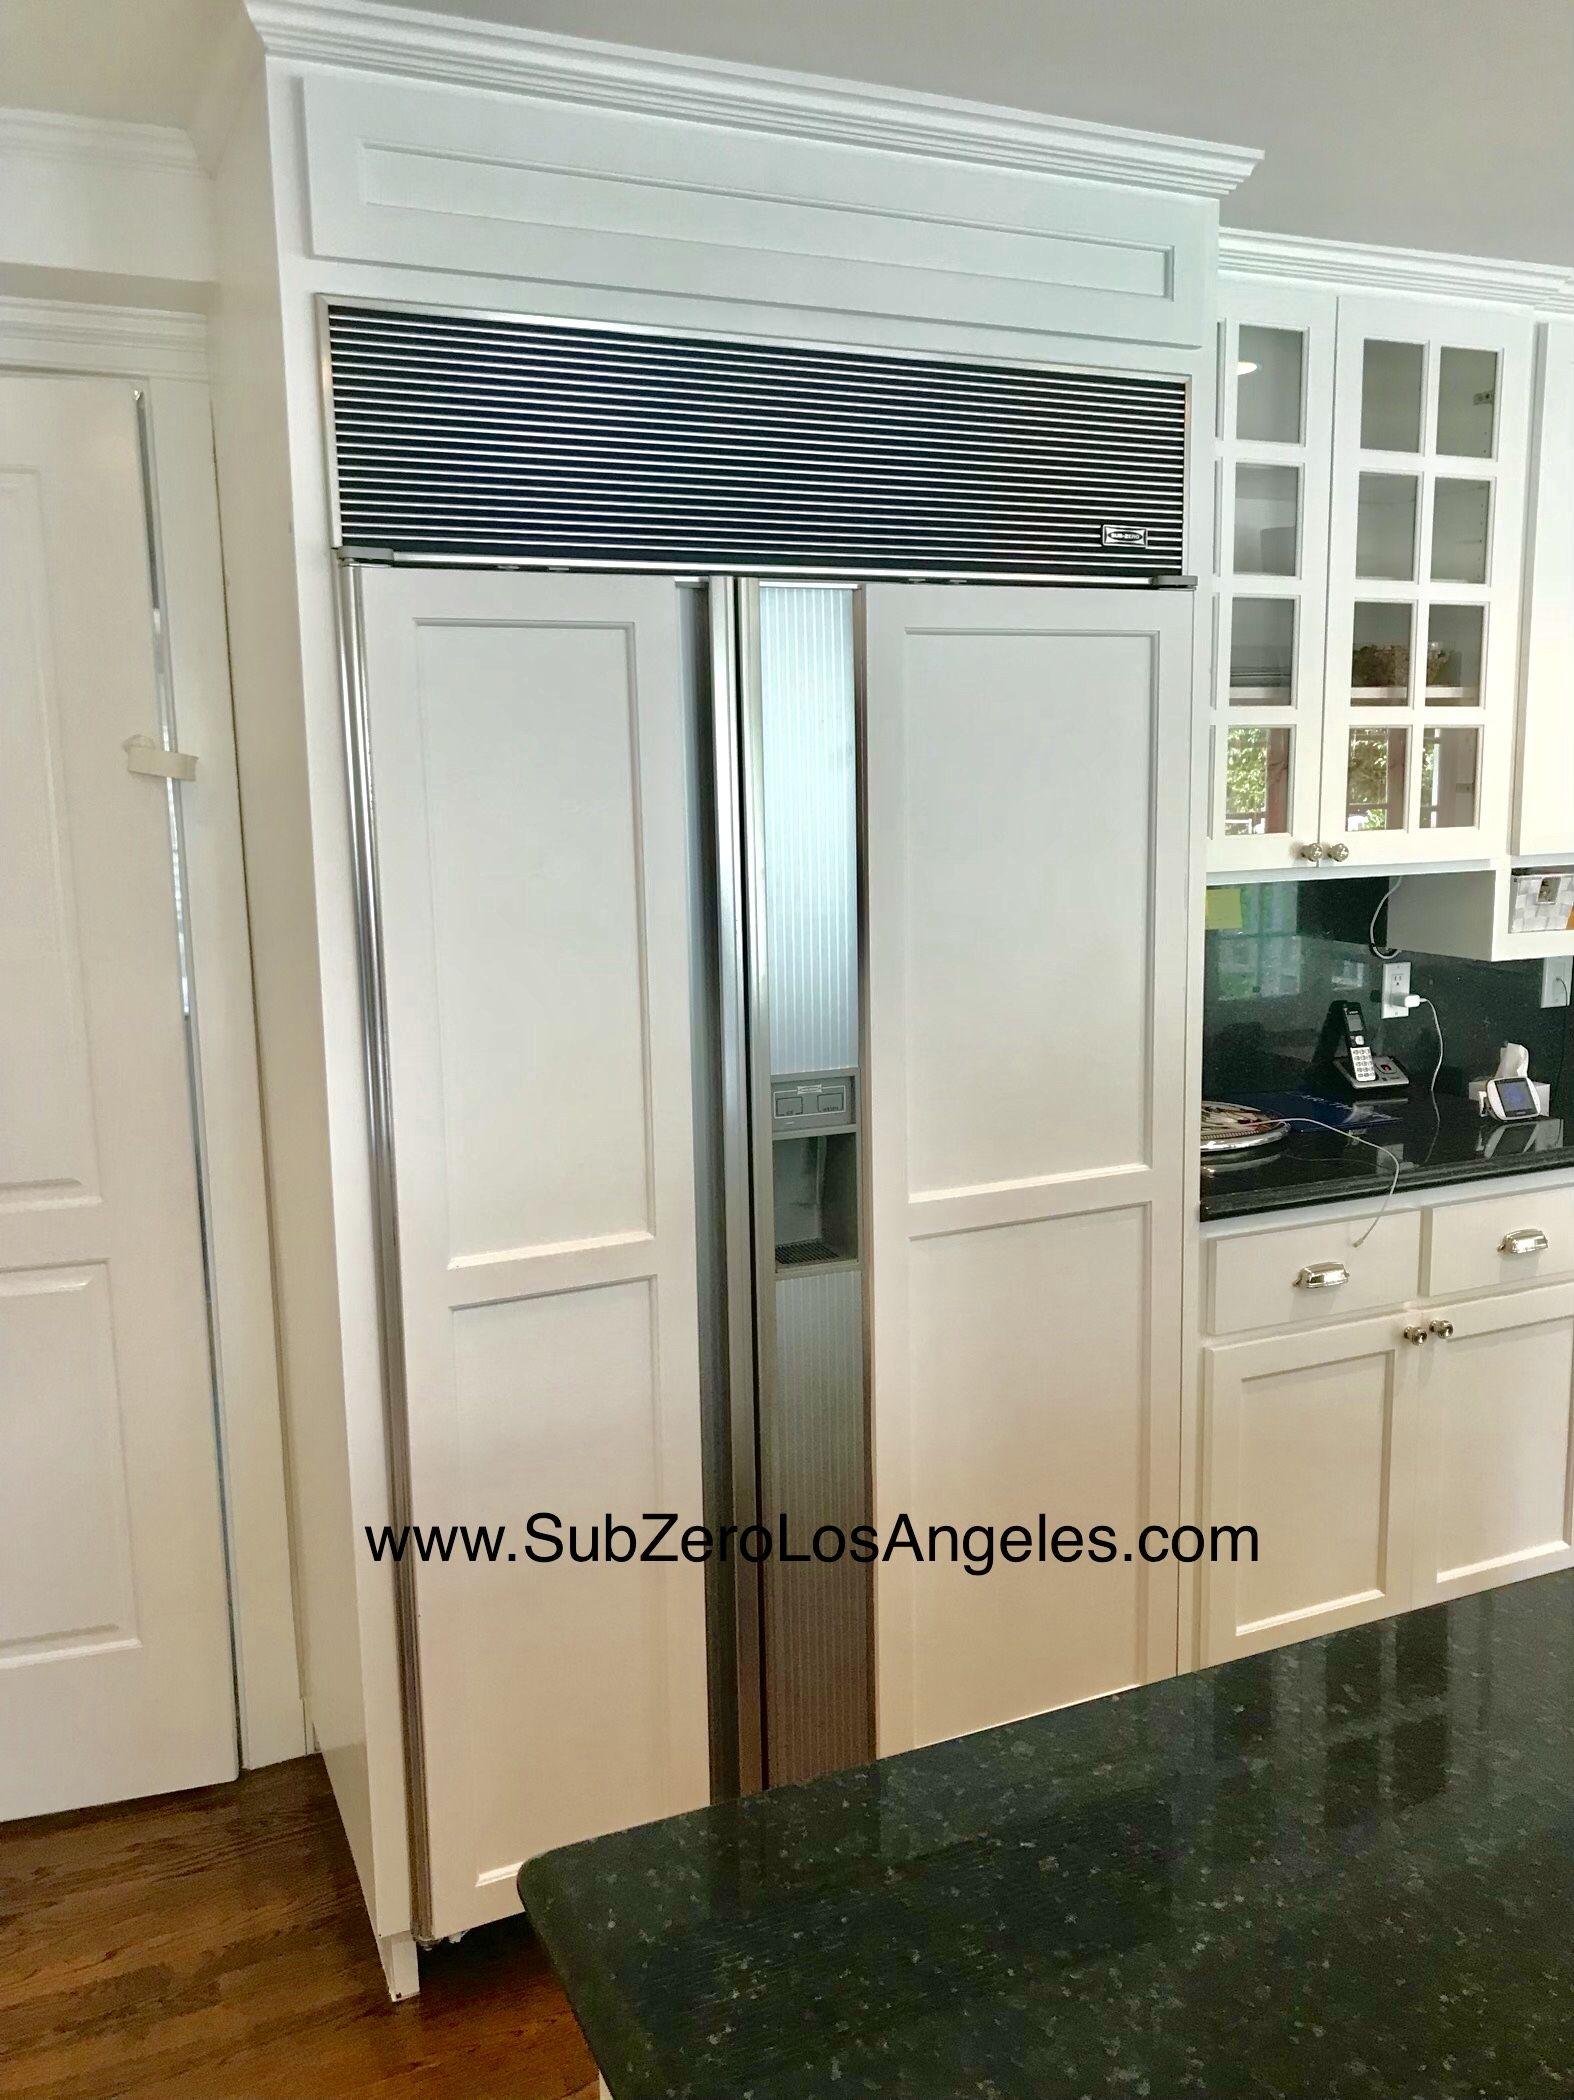 Los Angeles based since 1988 Sub Zero refrigerator repair